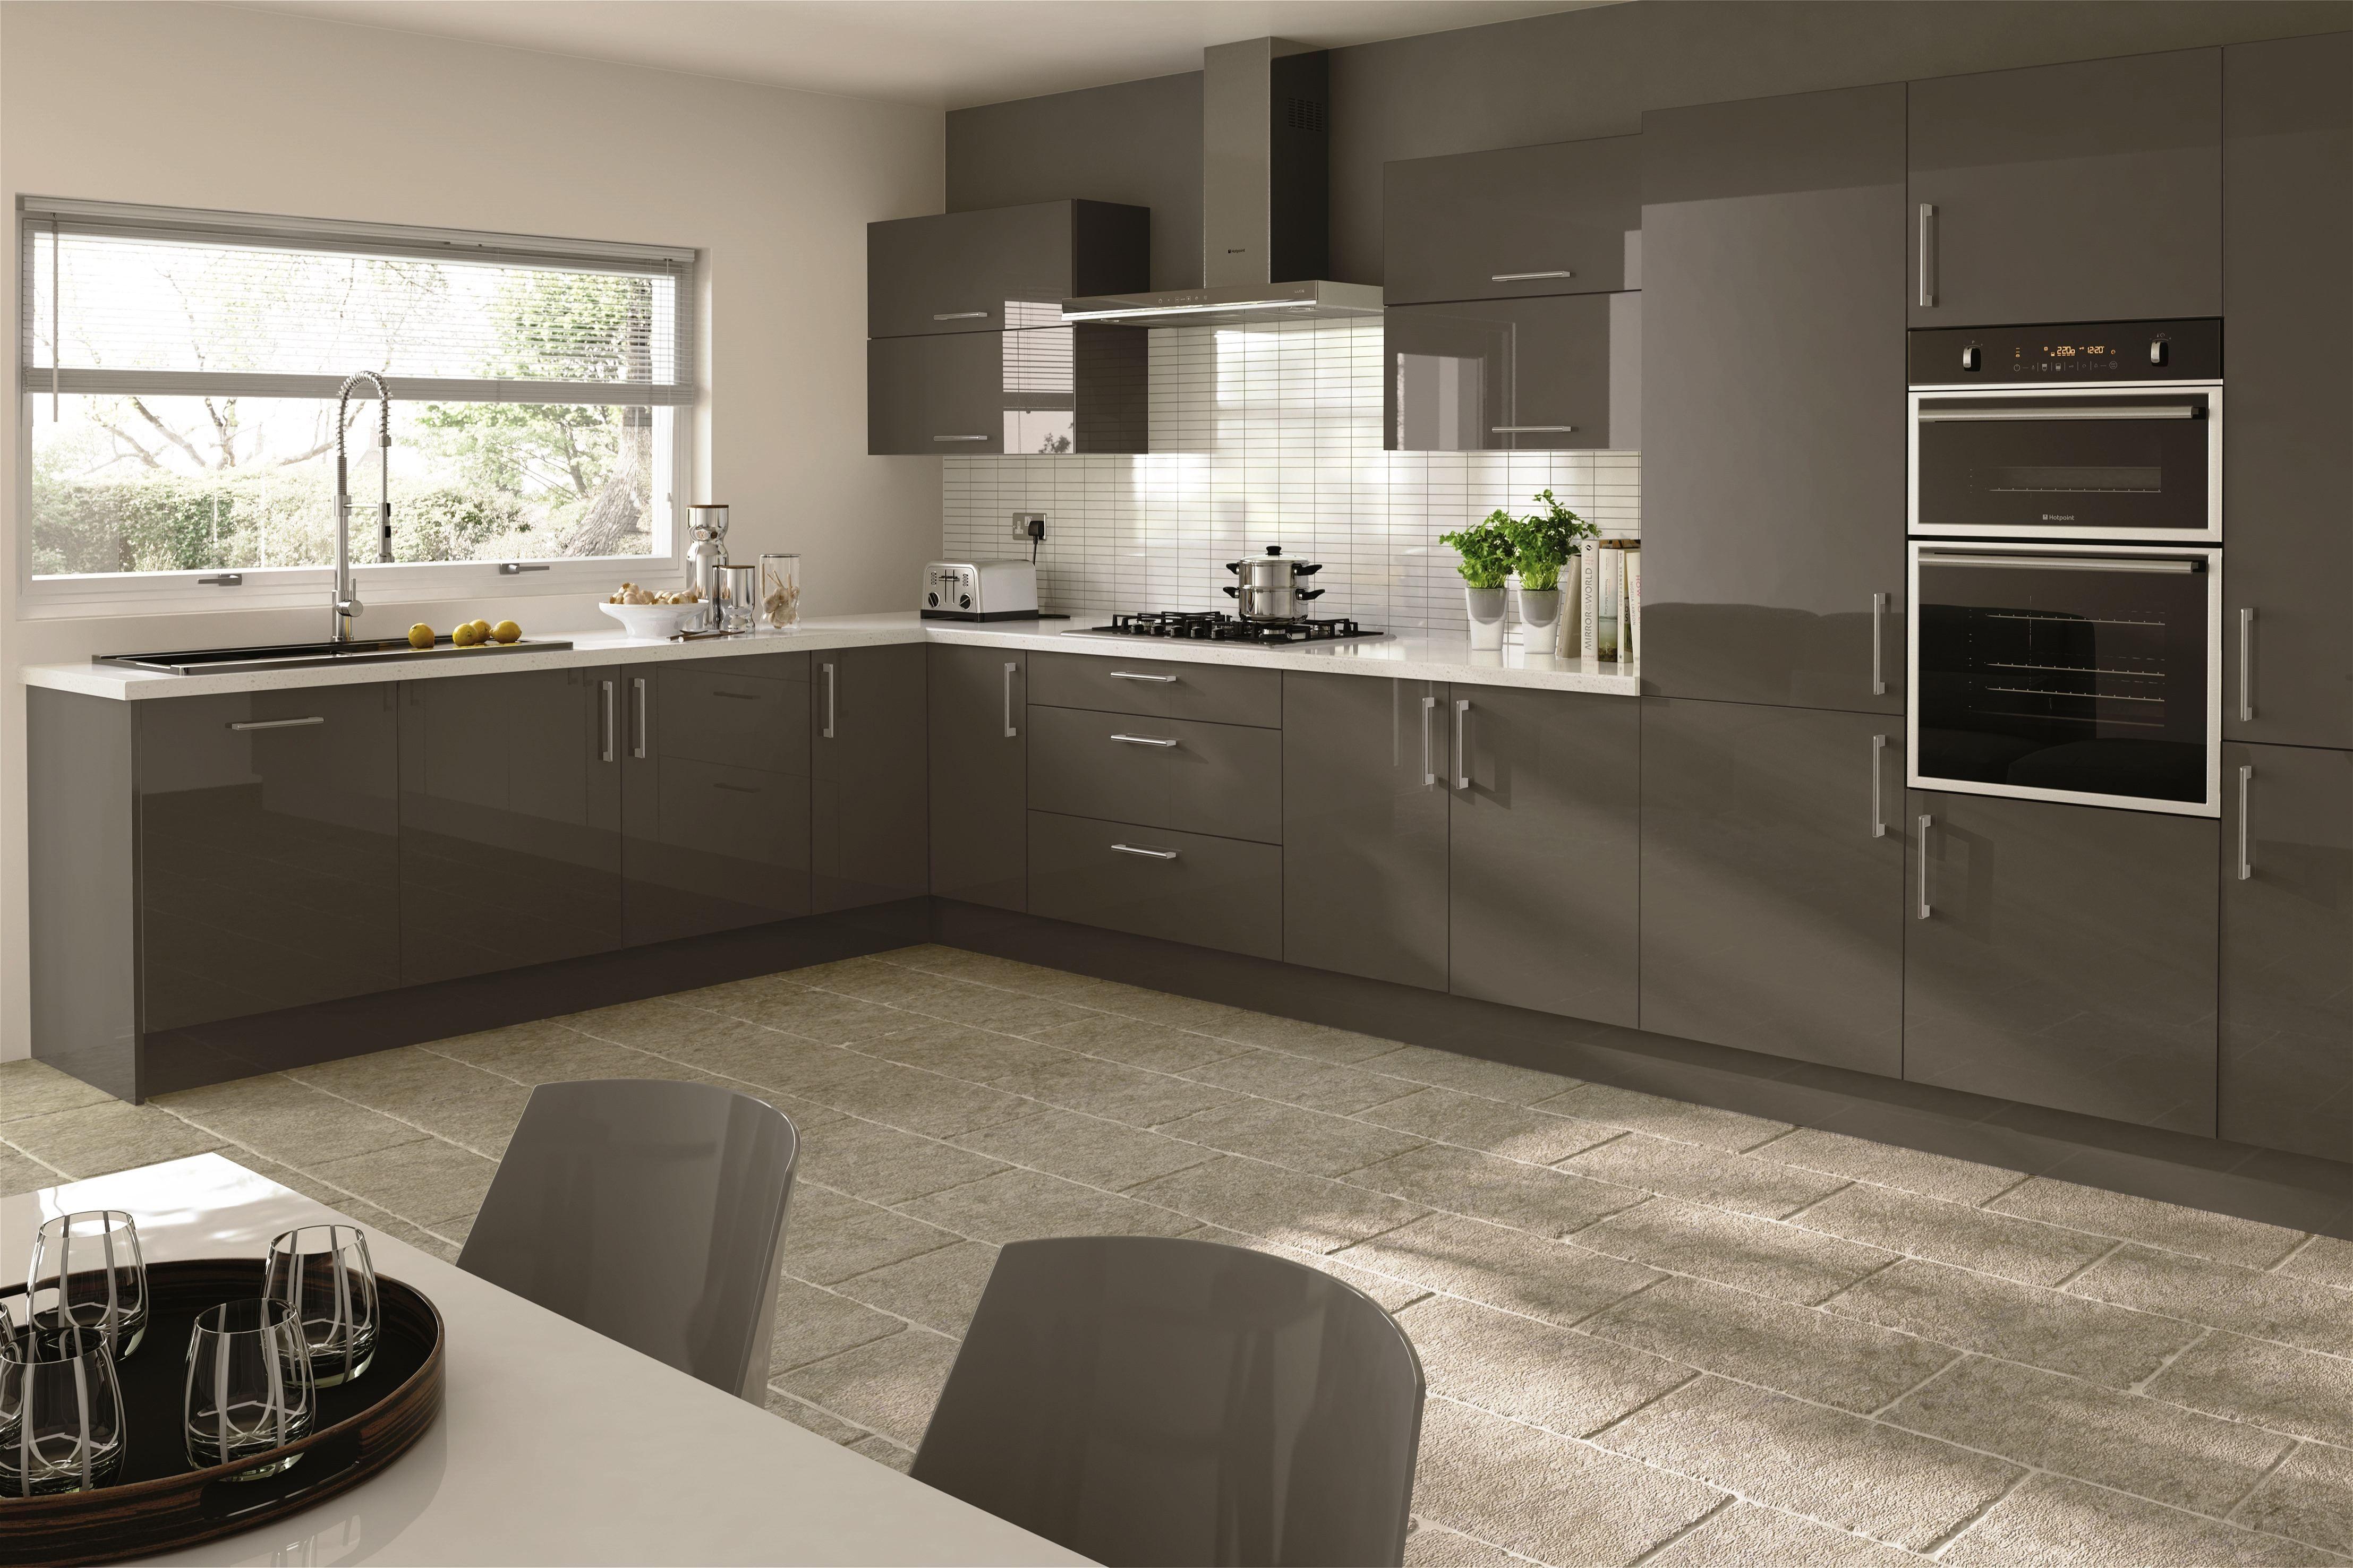 Kitchen Design Ideas Uk 2015 Gloss Kitchen Cabinets Replacement Kitchen Doors High Gloss Kitchen Cabinets